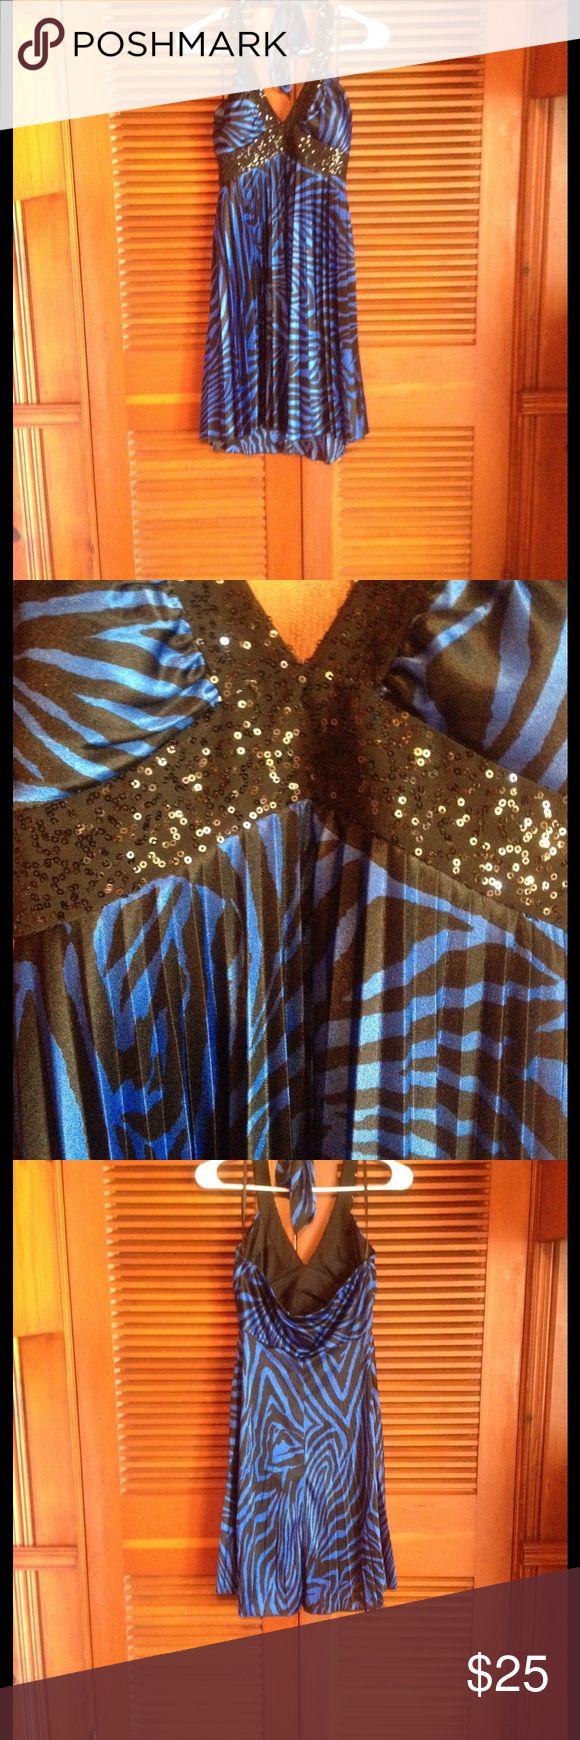 Halter dress B Smart juniors sz5/6 halter dress. Blue and black zebra pattern. Has padding in bust area. B Smart Dresses